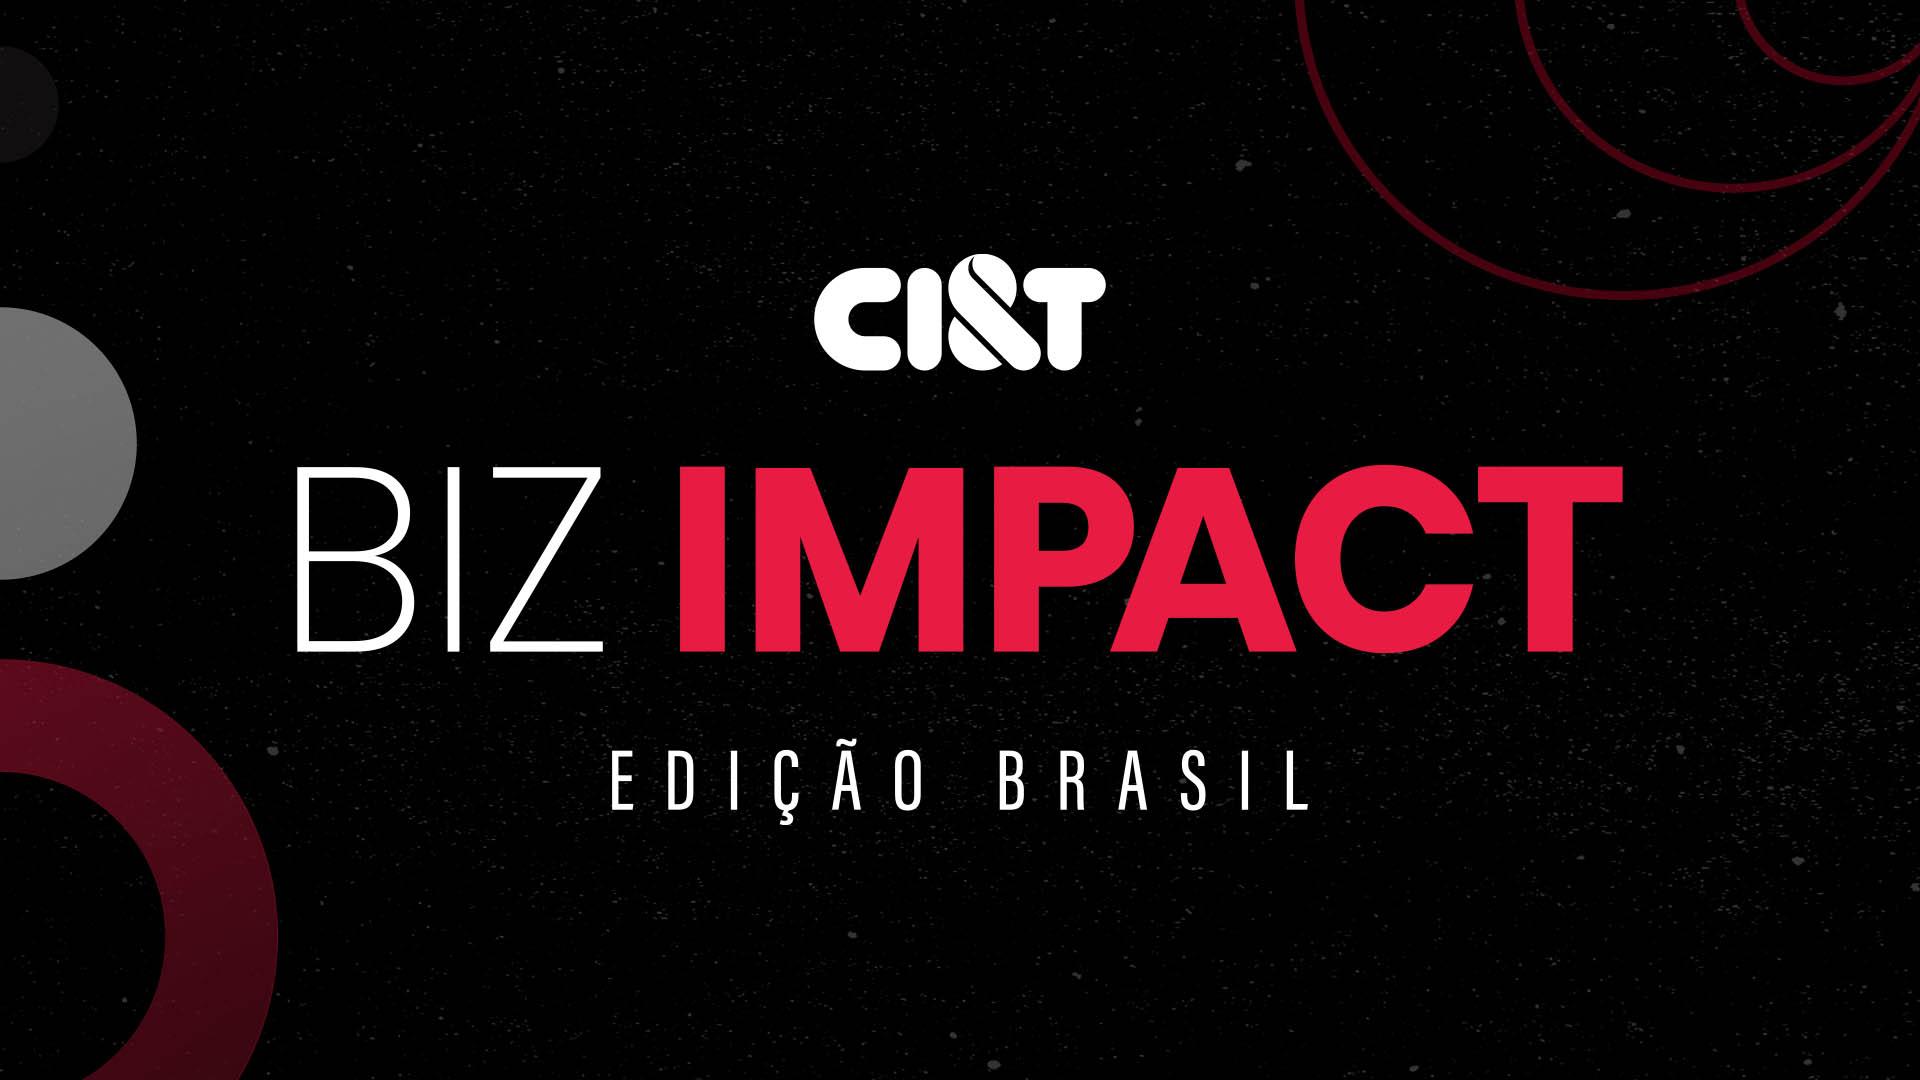 CI&T Biz Impact 2021 Edição Brasil